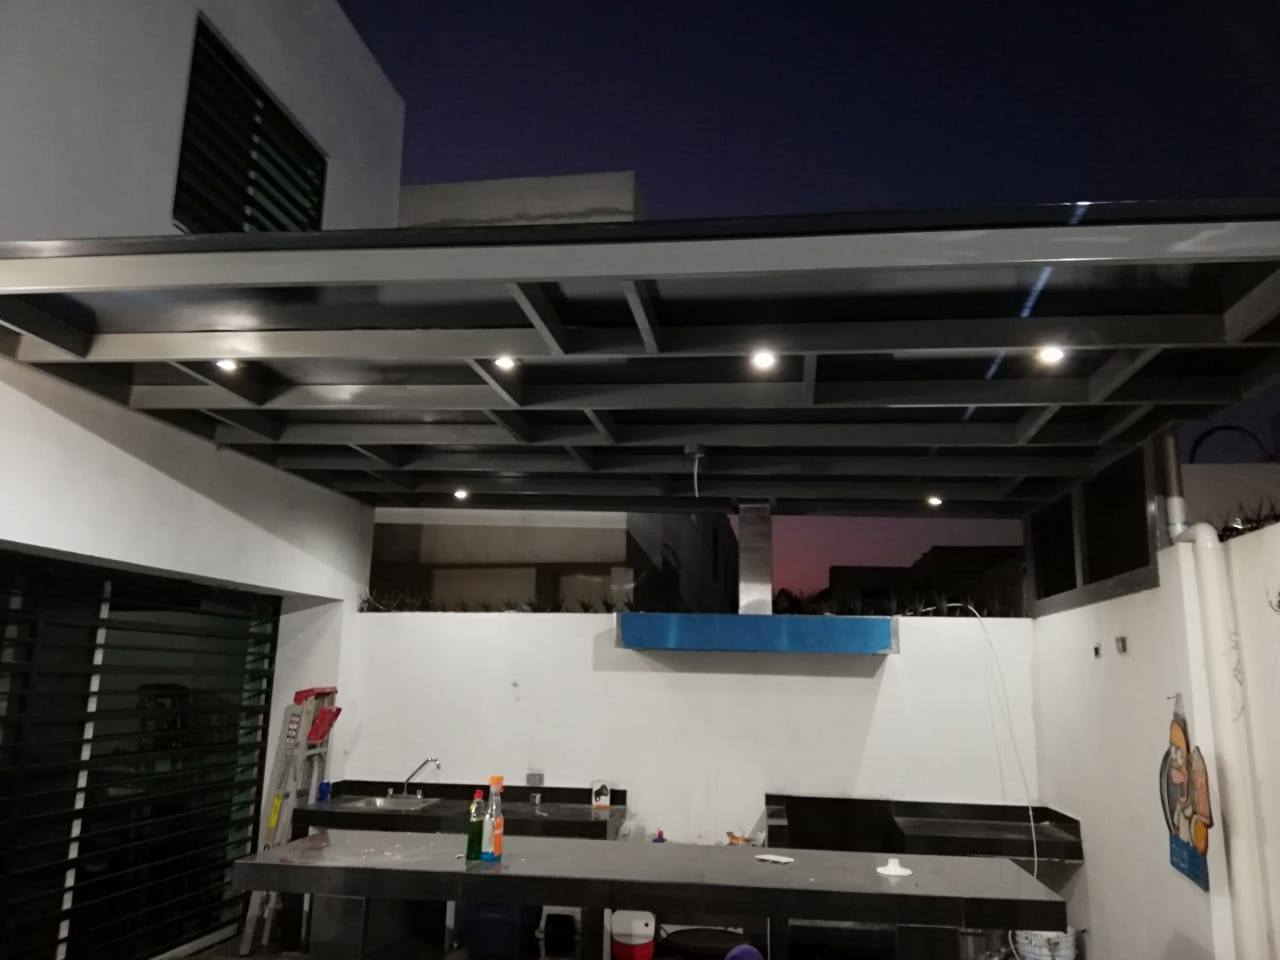 techo de policarbonato celular en patio